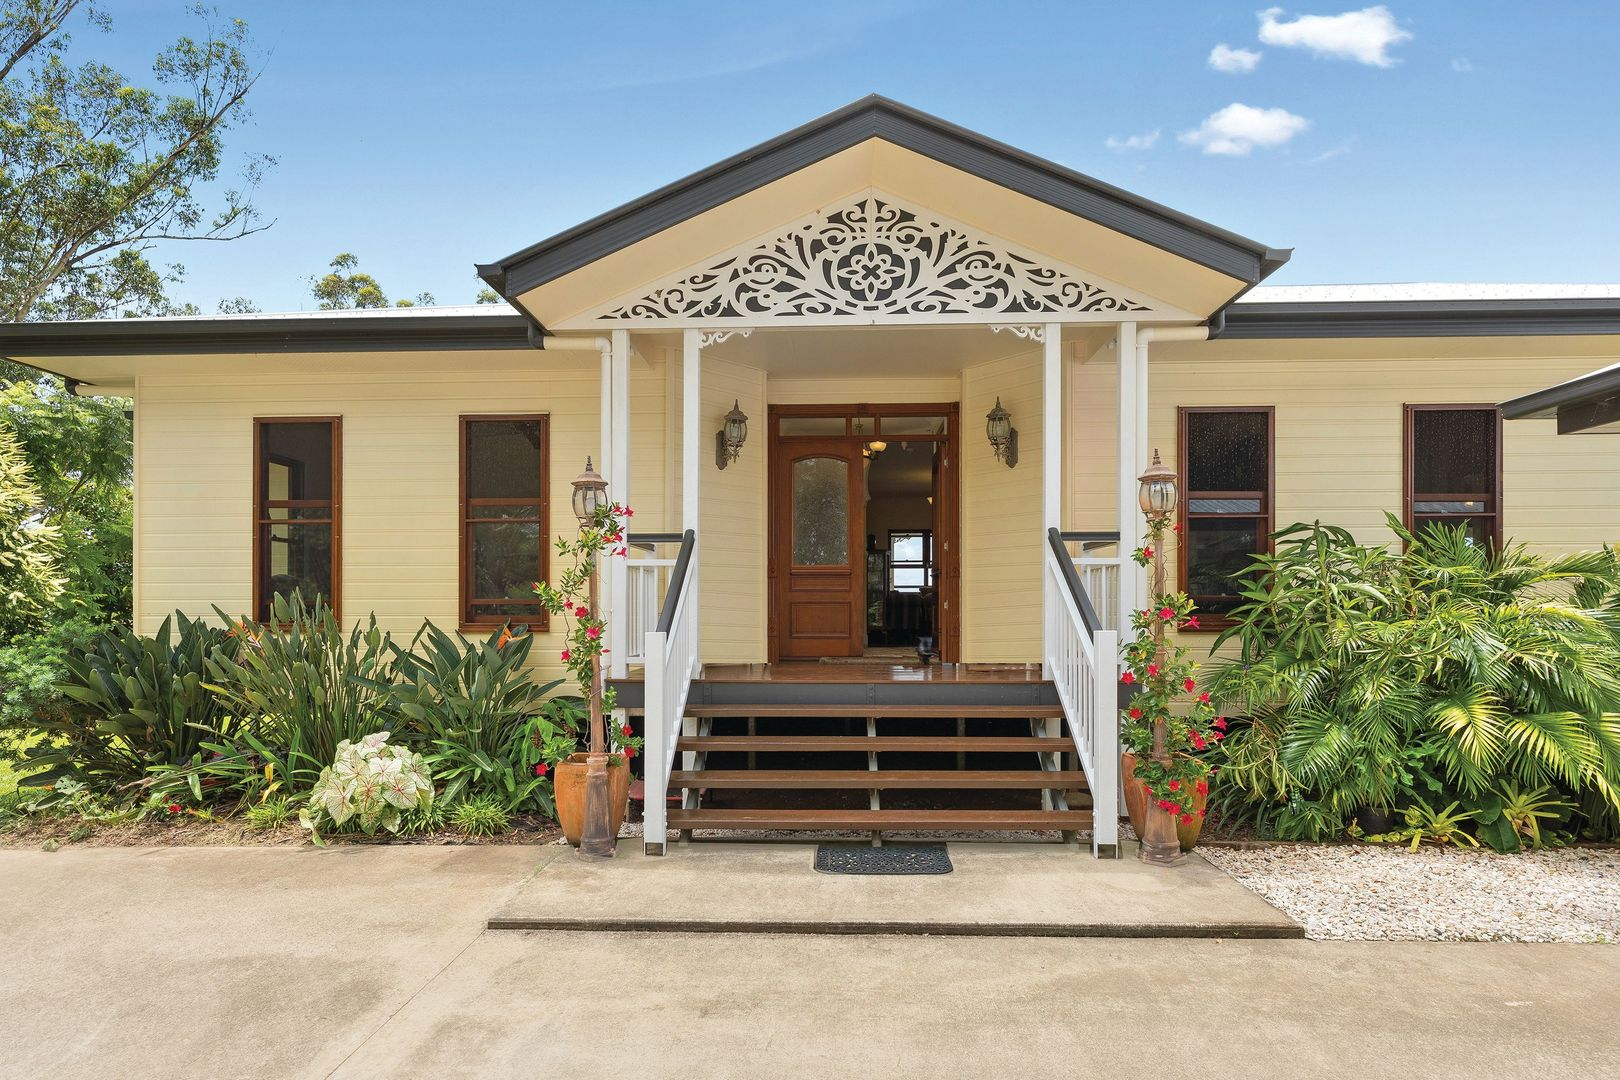 371 Palmwoods-montville Rd, Palmwoods QLD 4555, Image 2